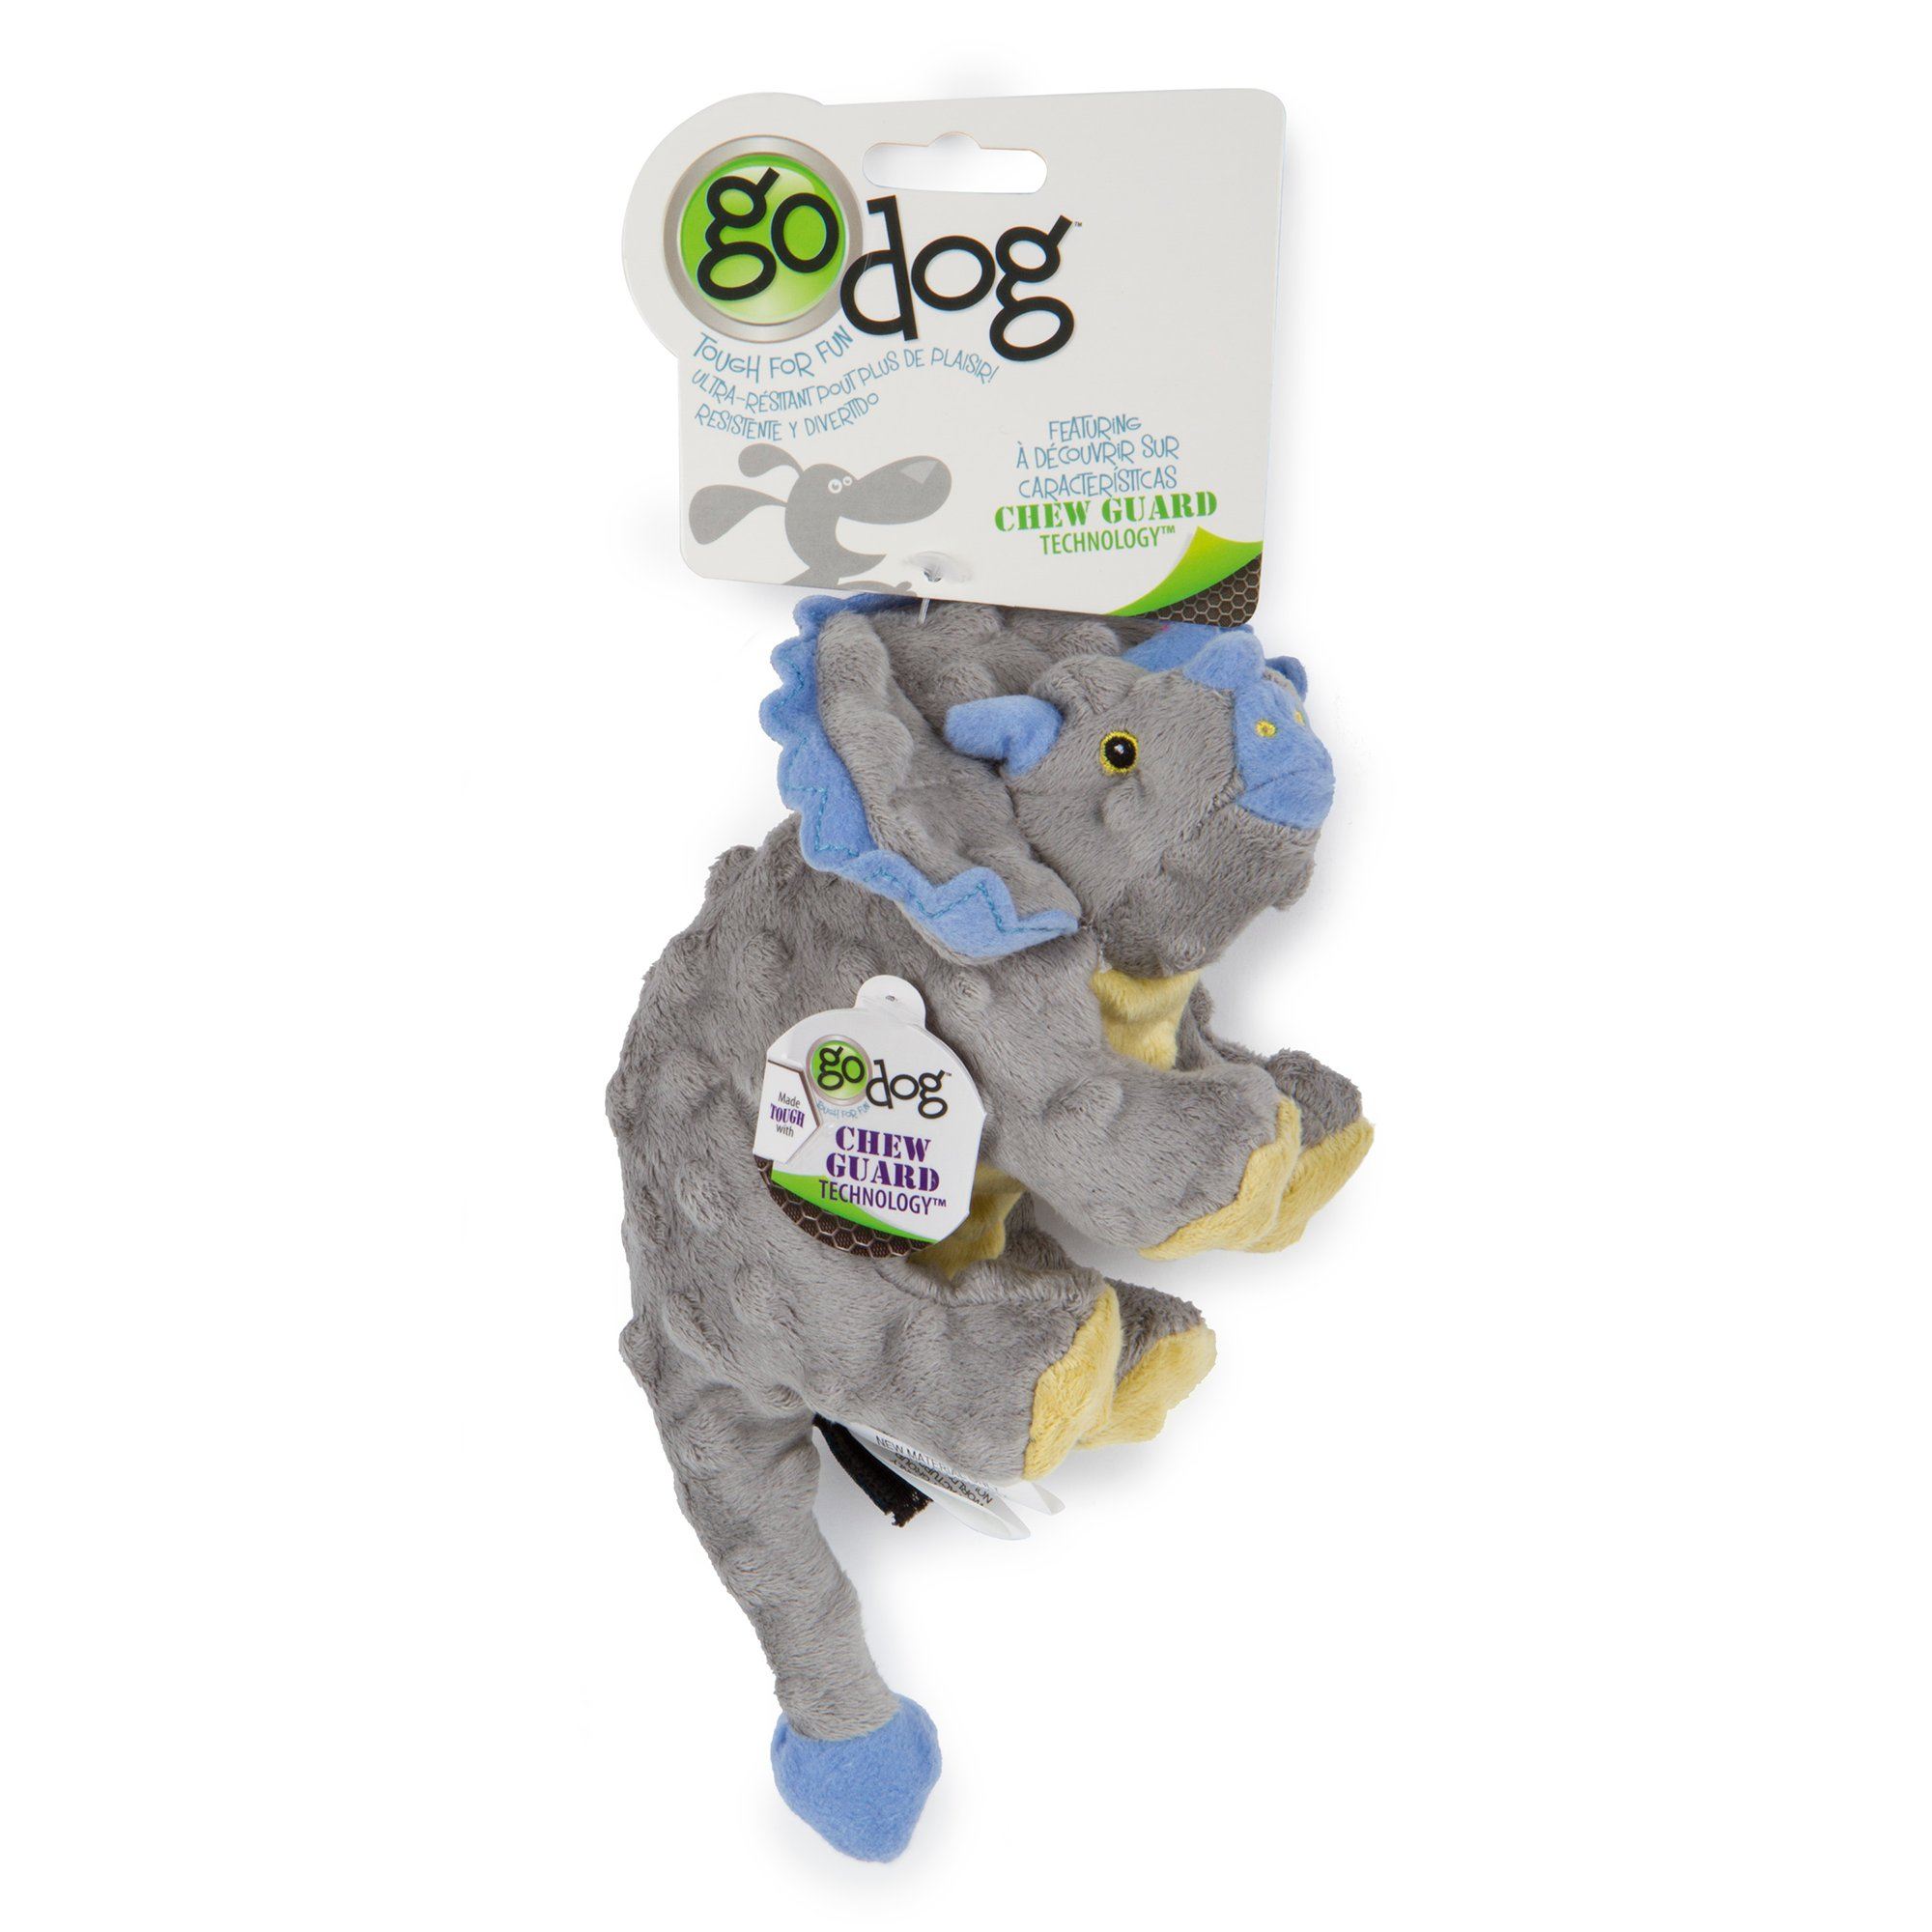 Image of Godog Dinos Frills Gray Small W/ Chew Guard Grey, Small, Grey / Blue